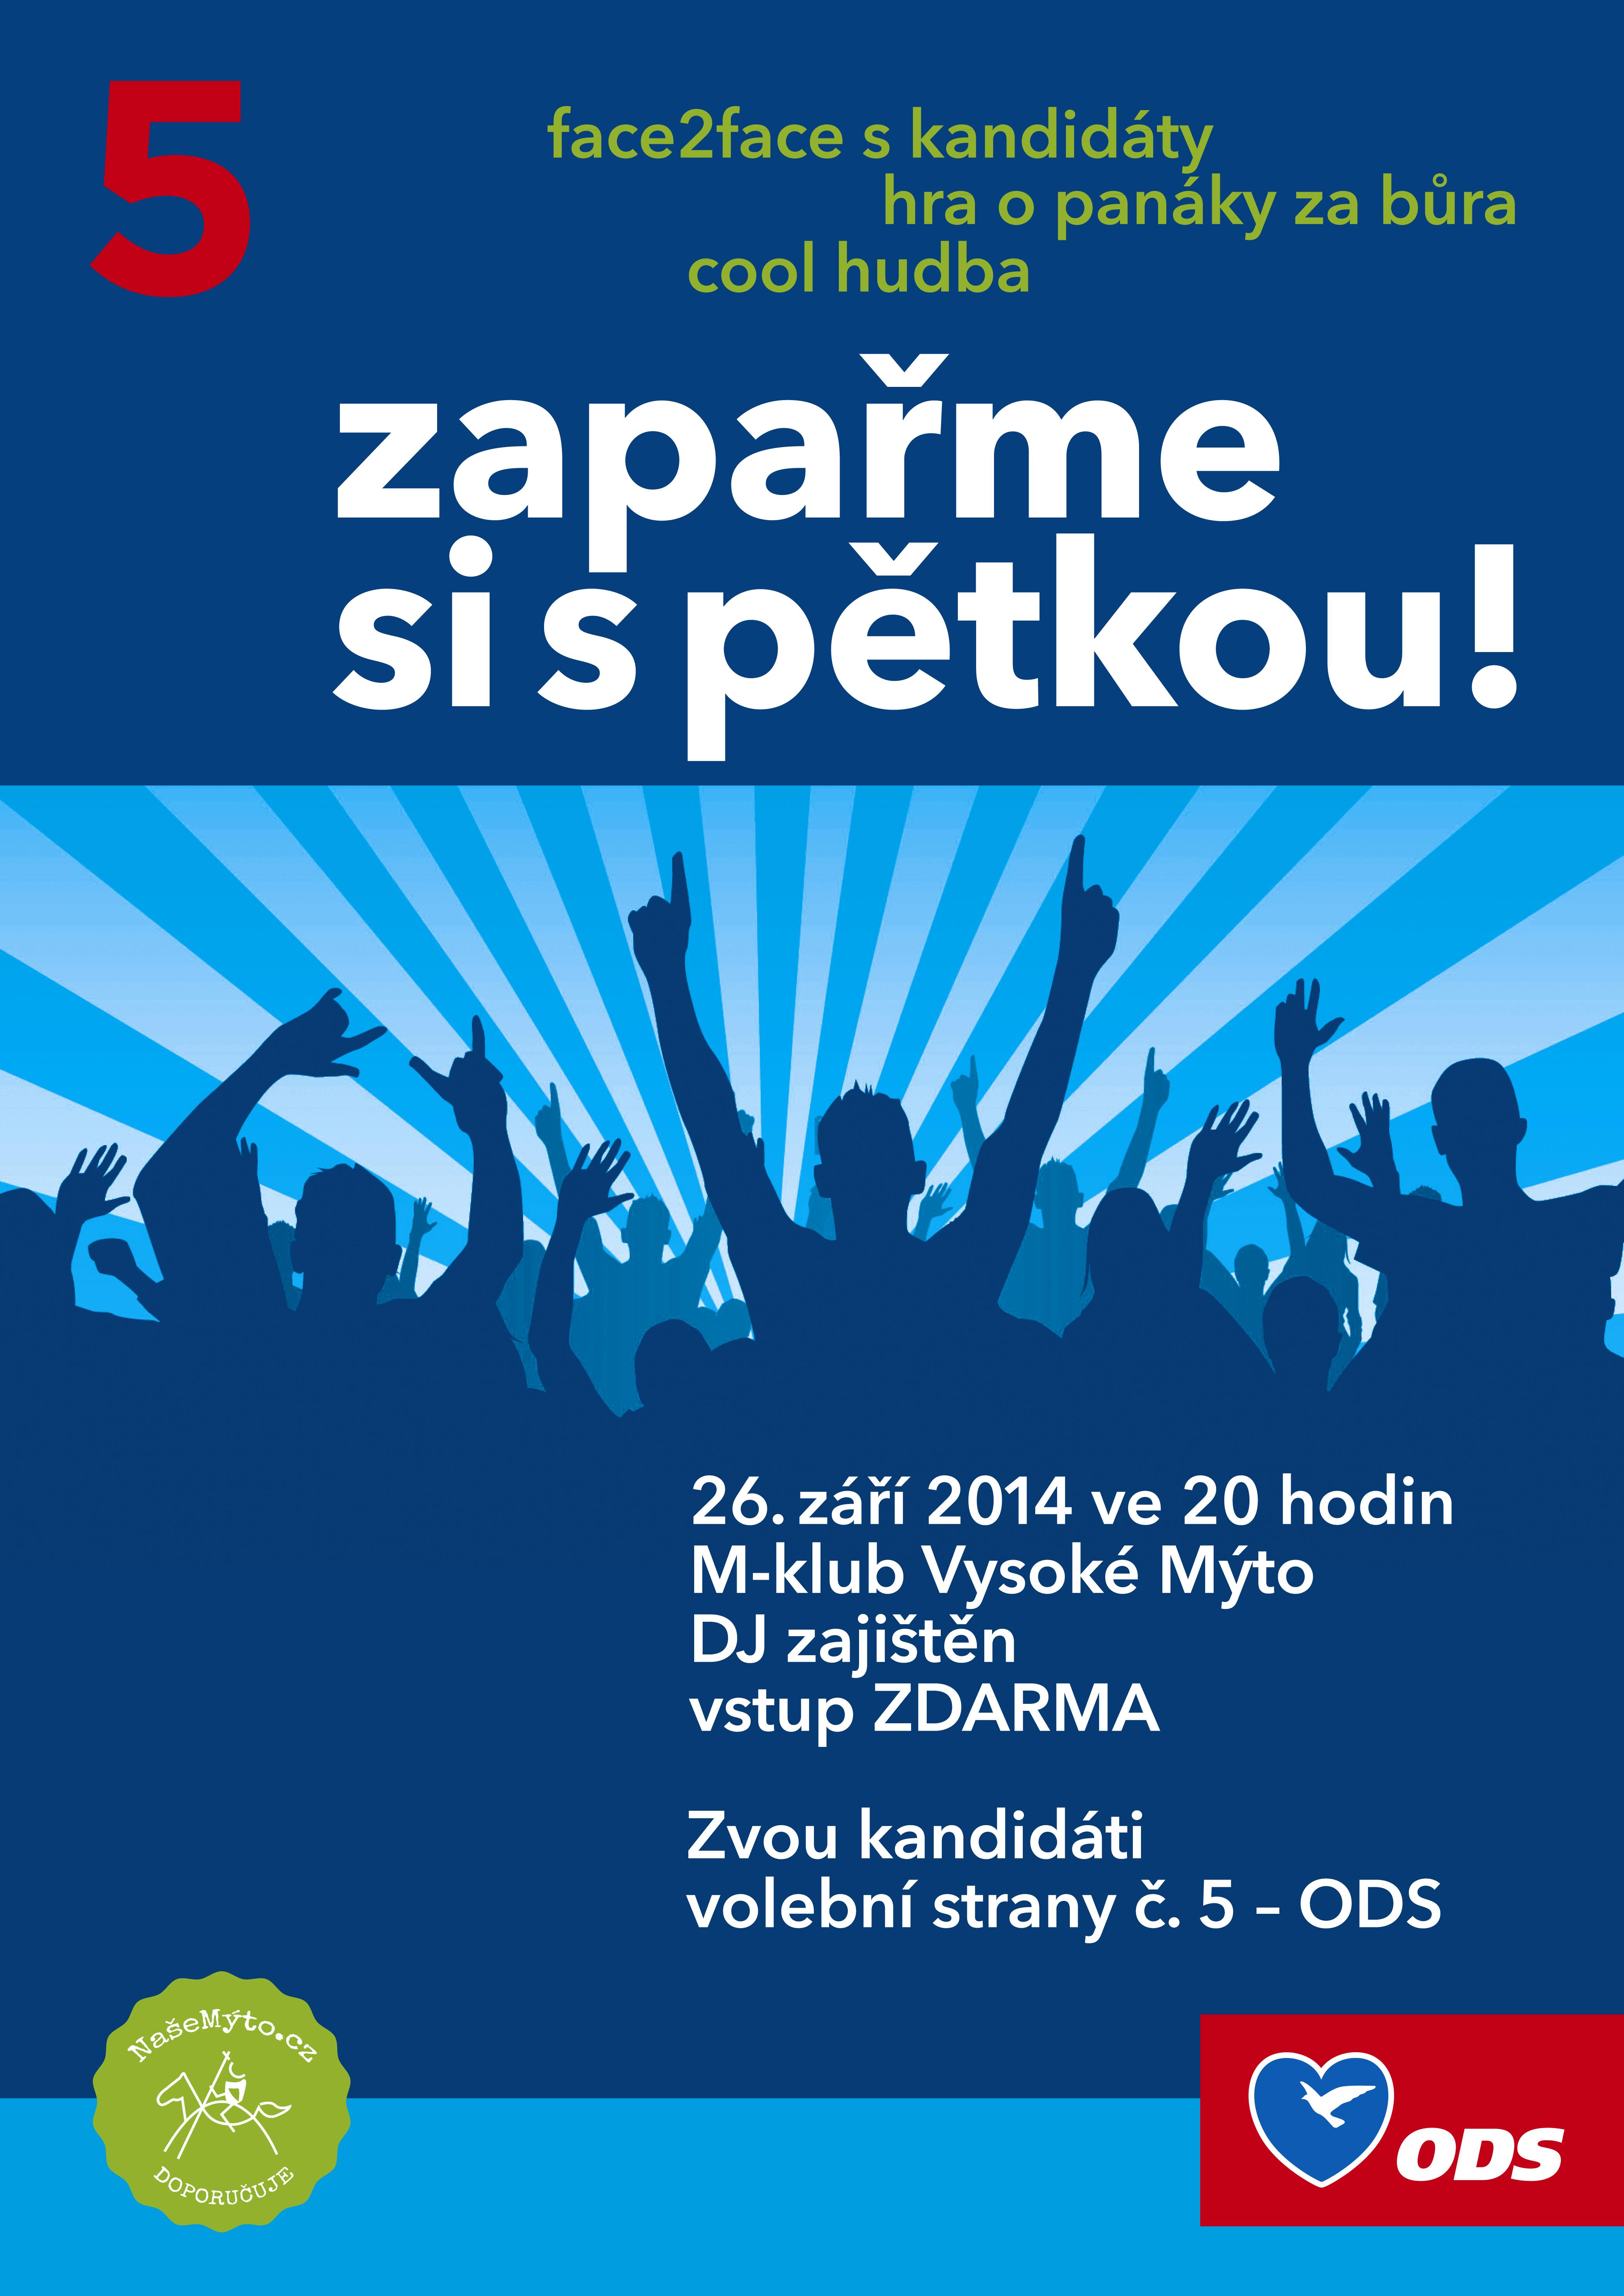 ODS_Zaparme_si_plakat_2.cdr